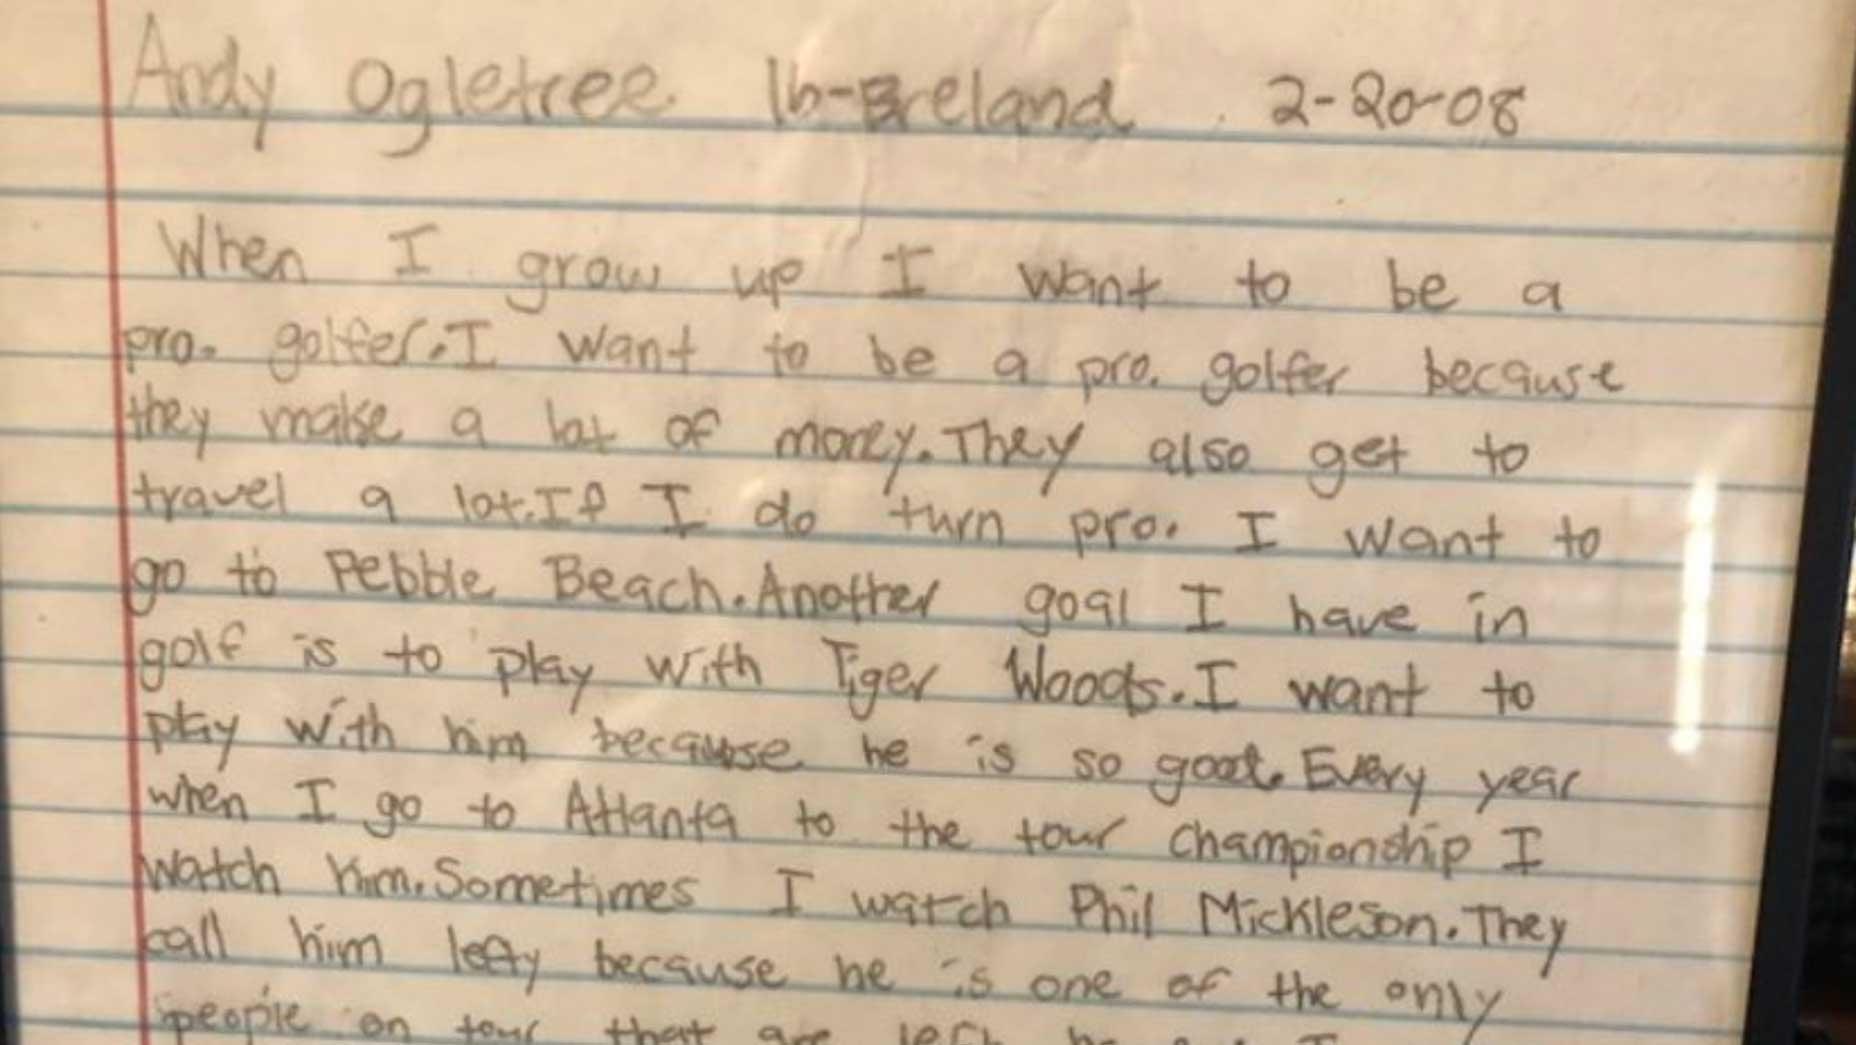 andy ogletree letter